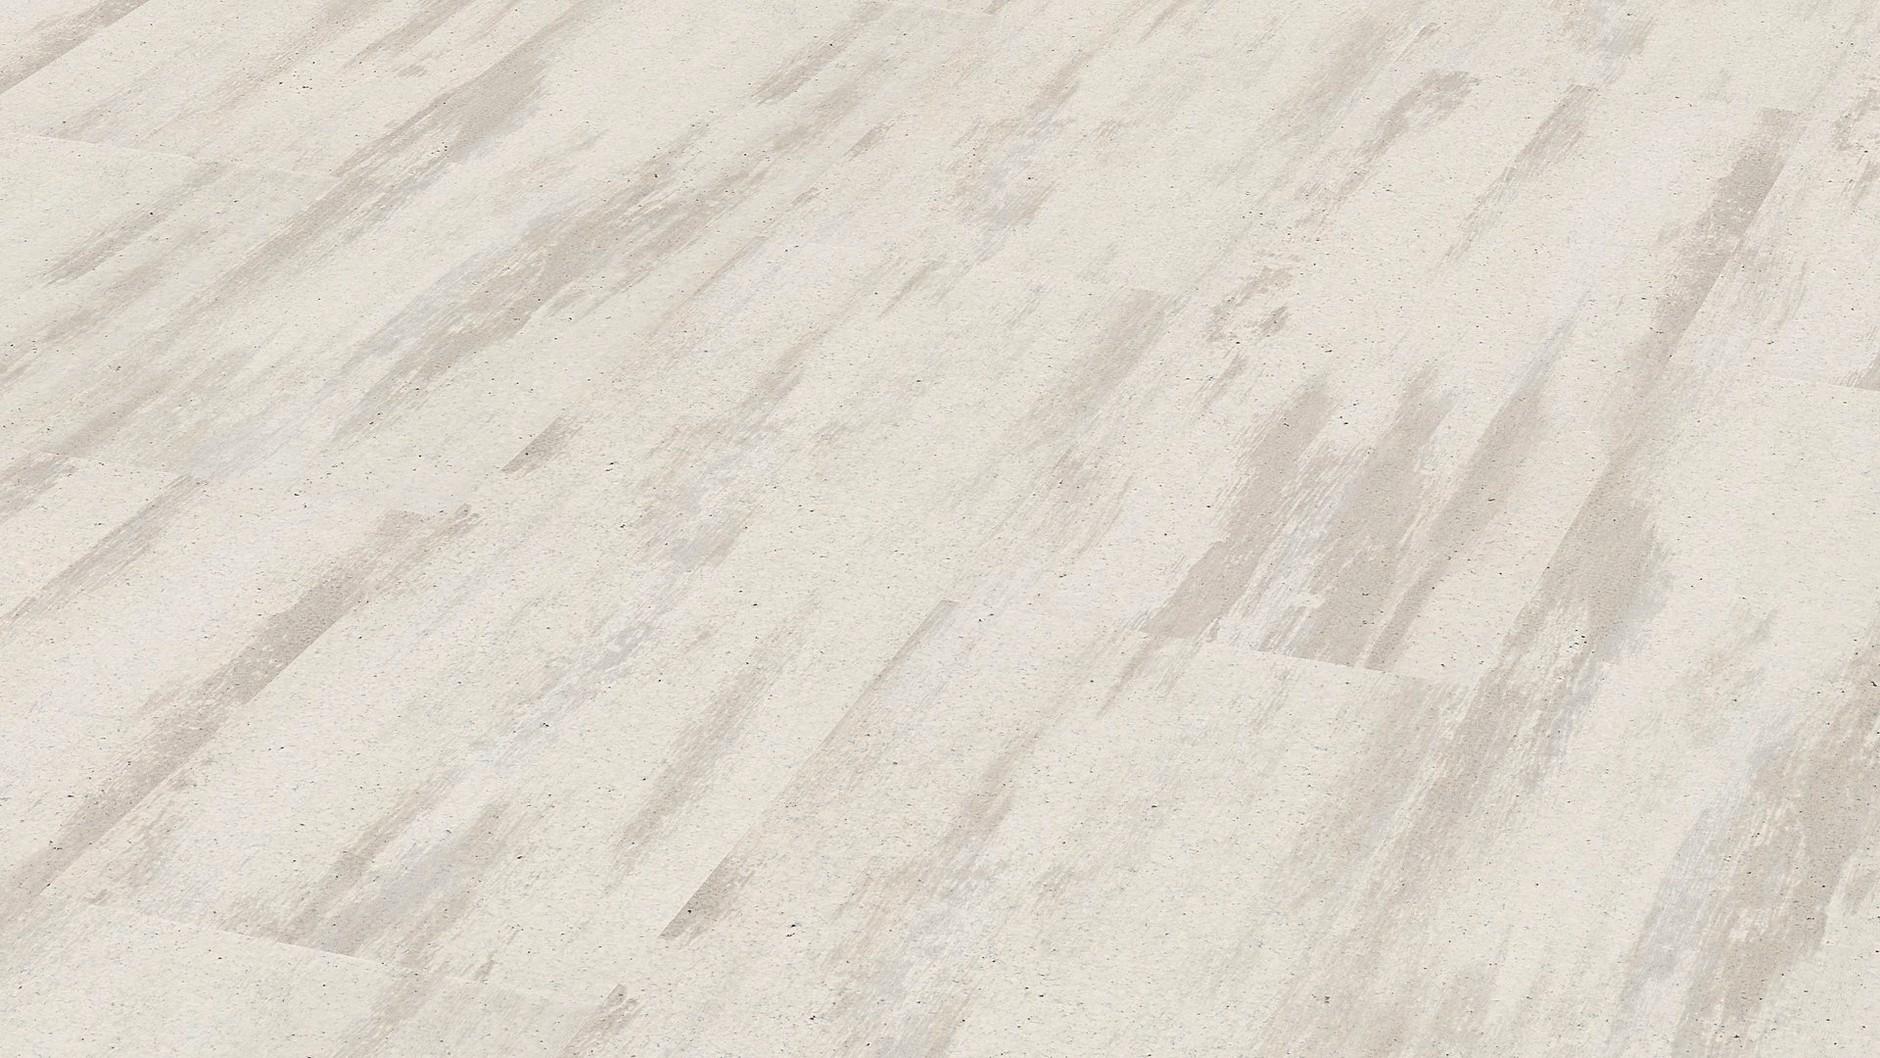 Kork Fußbodenplatten ~ Korkboden weiß grau kork natura stone beton aschgrau nabo